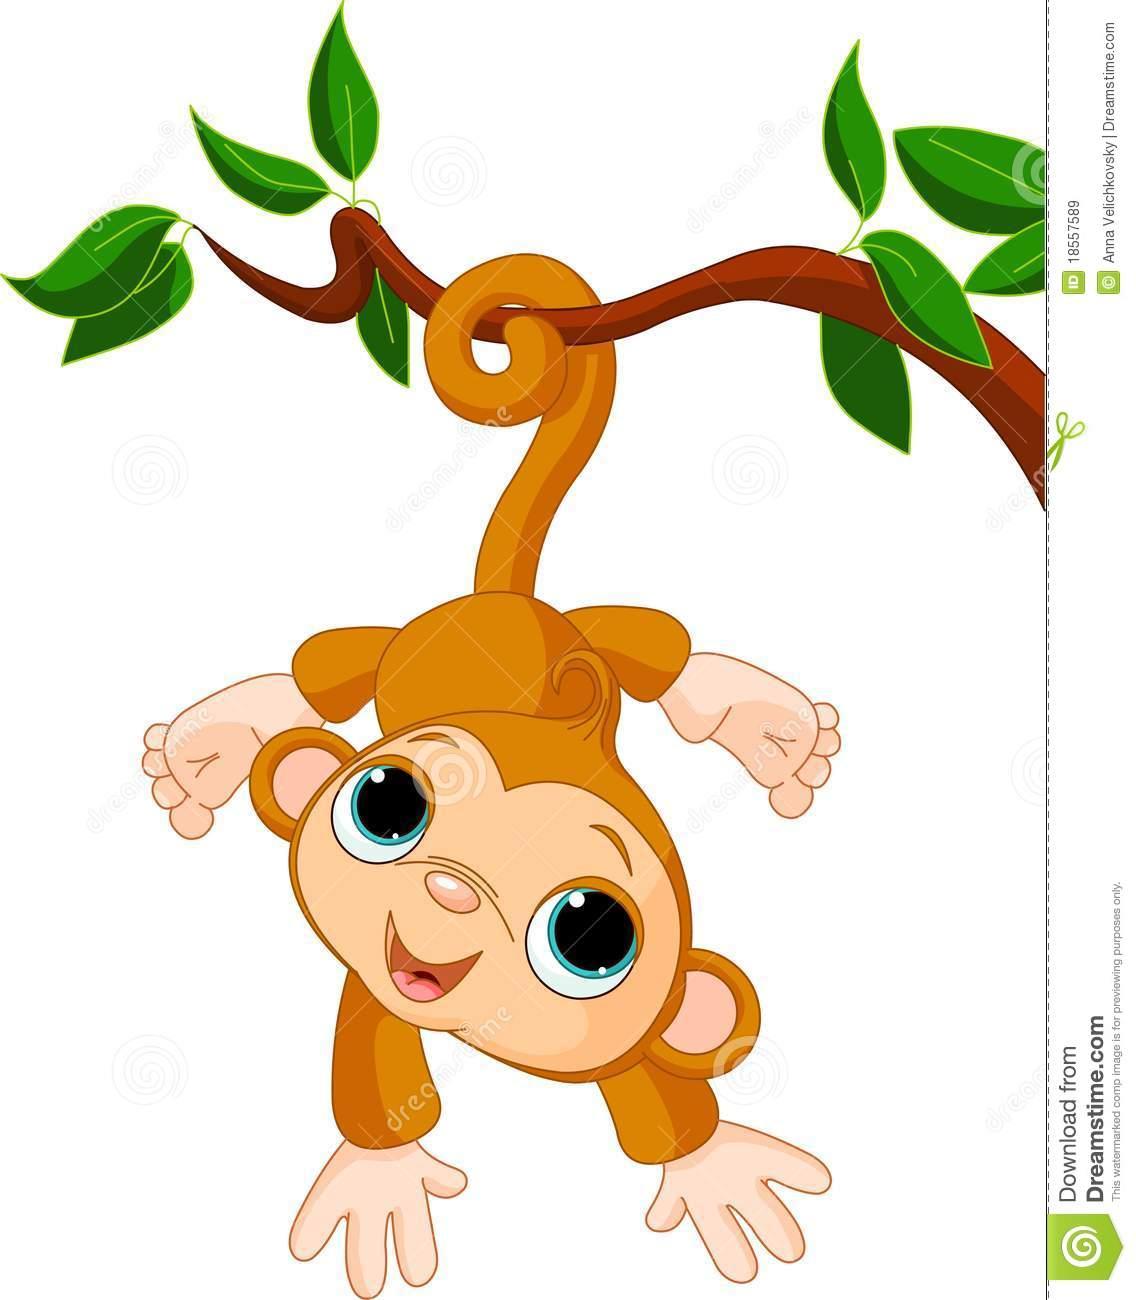 1136x1300 Girl Monkey Clip Art Monkey In A Tree Clipart Baby Monkey Tree